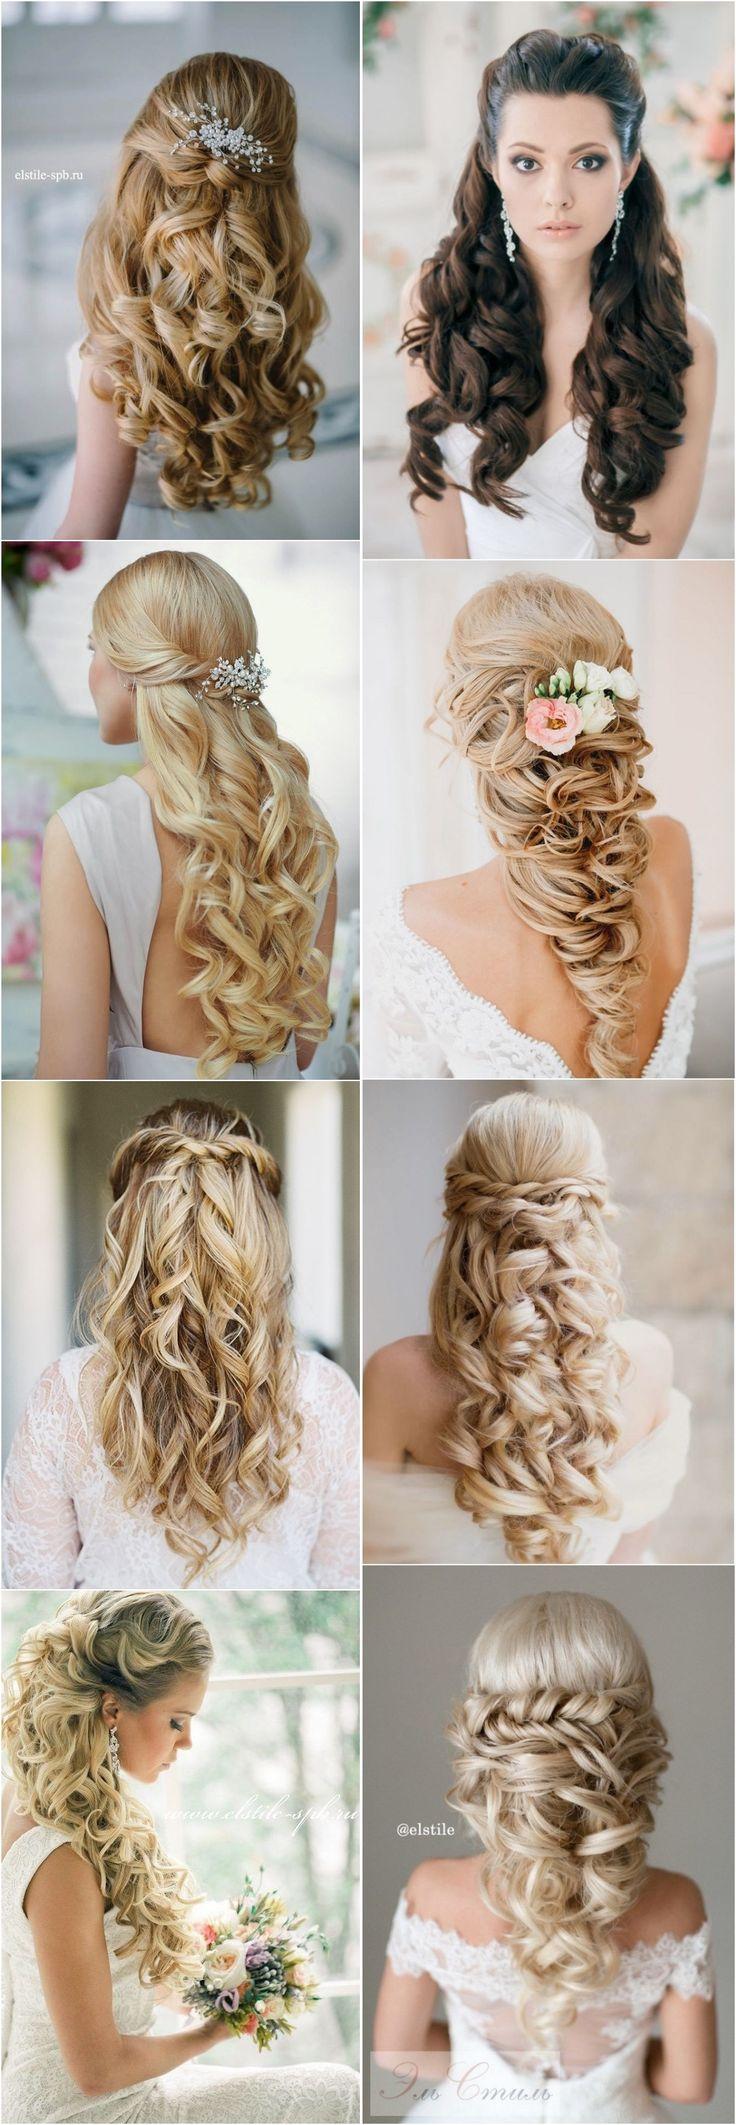 Peinado-stunning-half-up-half-down-wedding-hairstyles-with-tutorial/40 Stunning ...